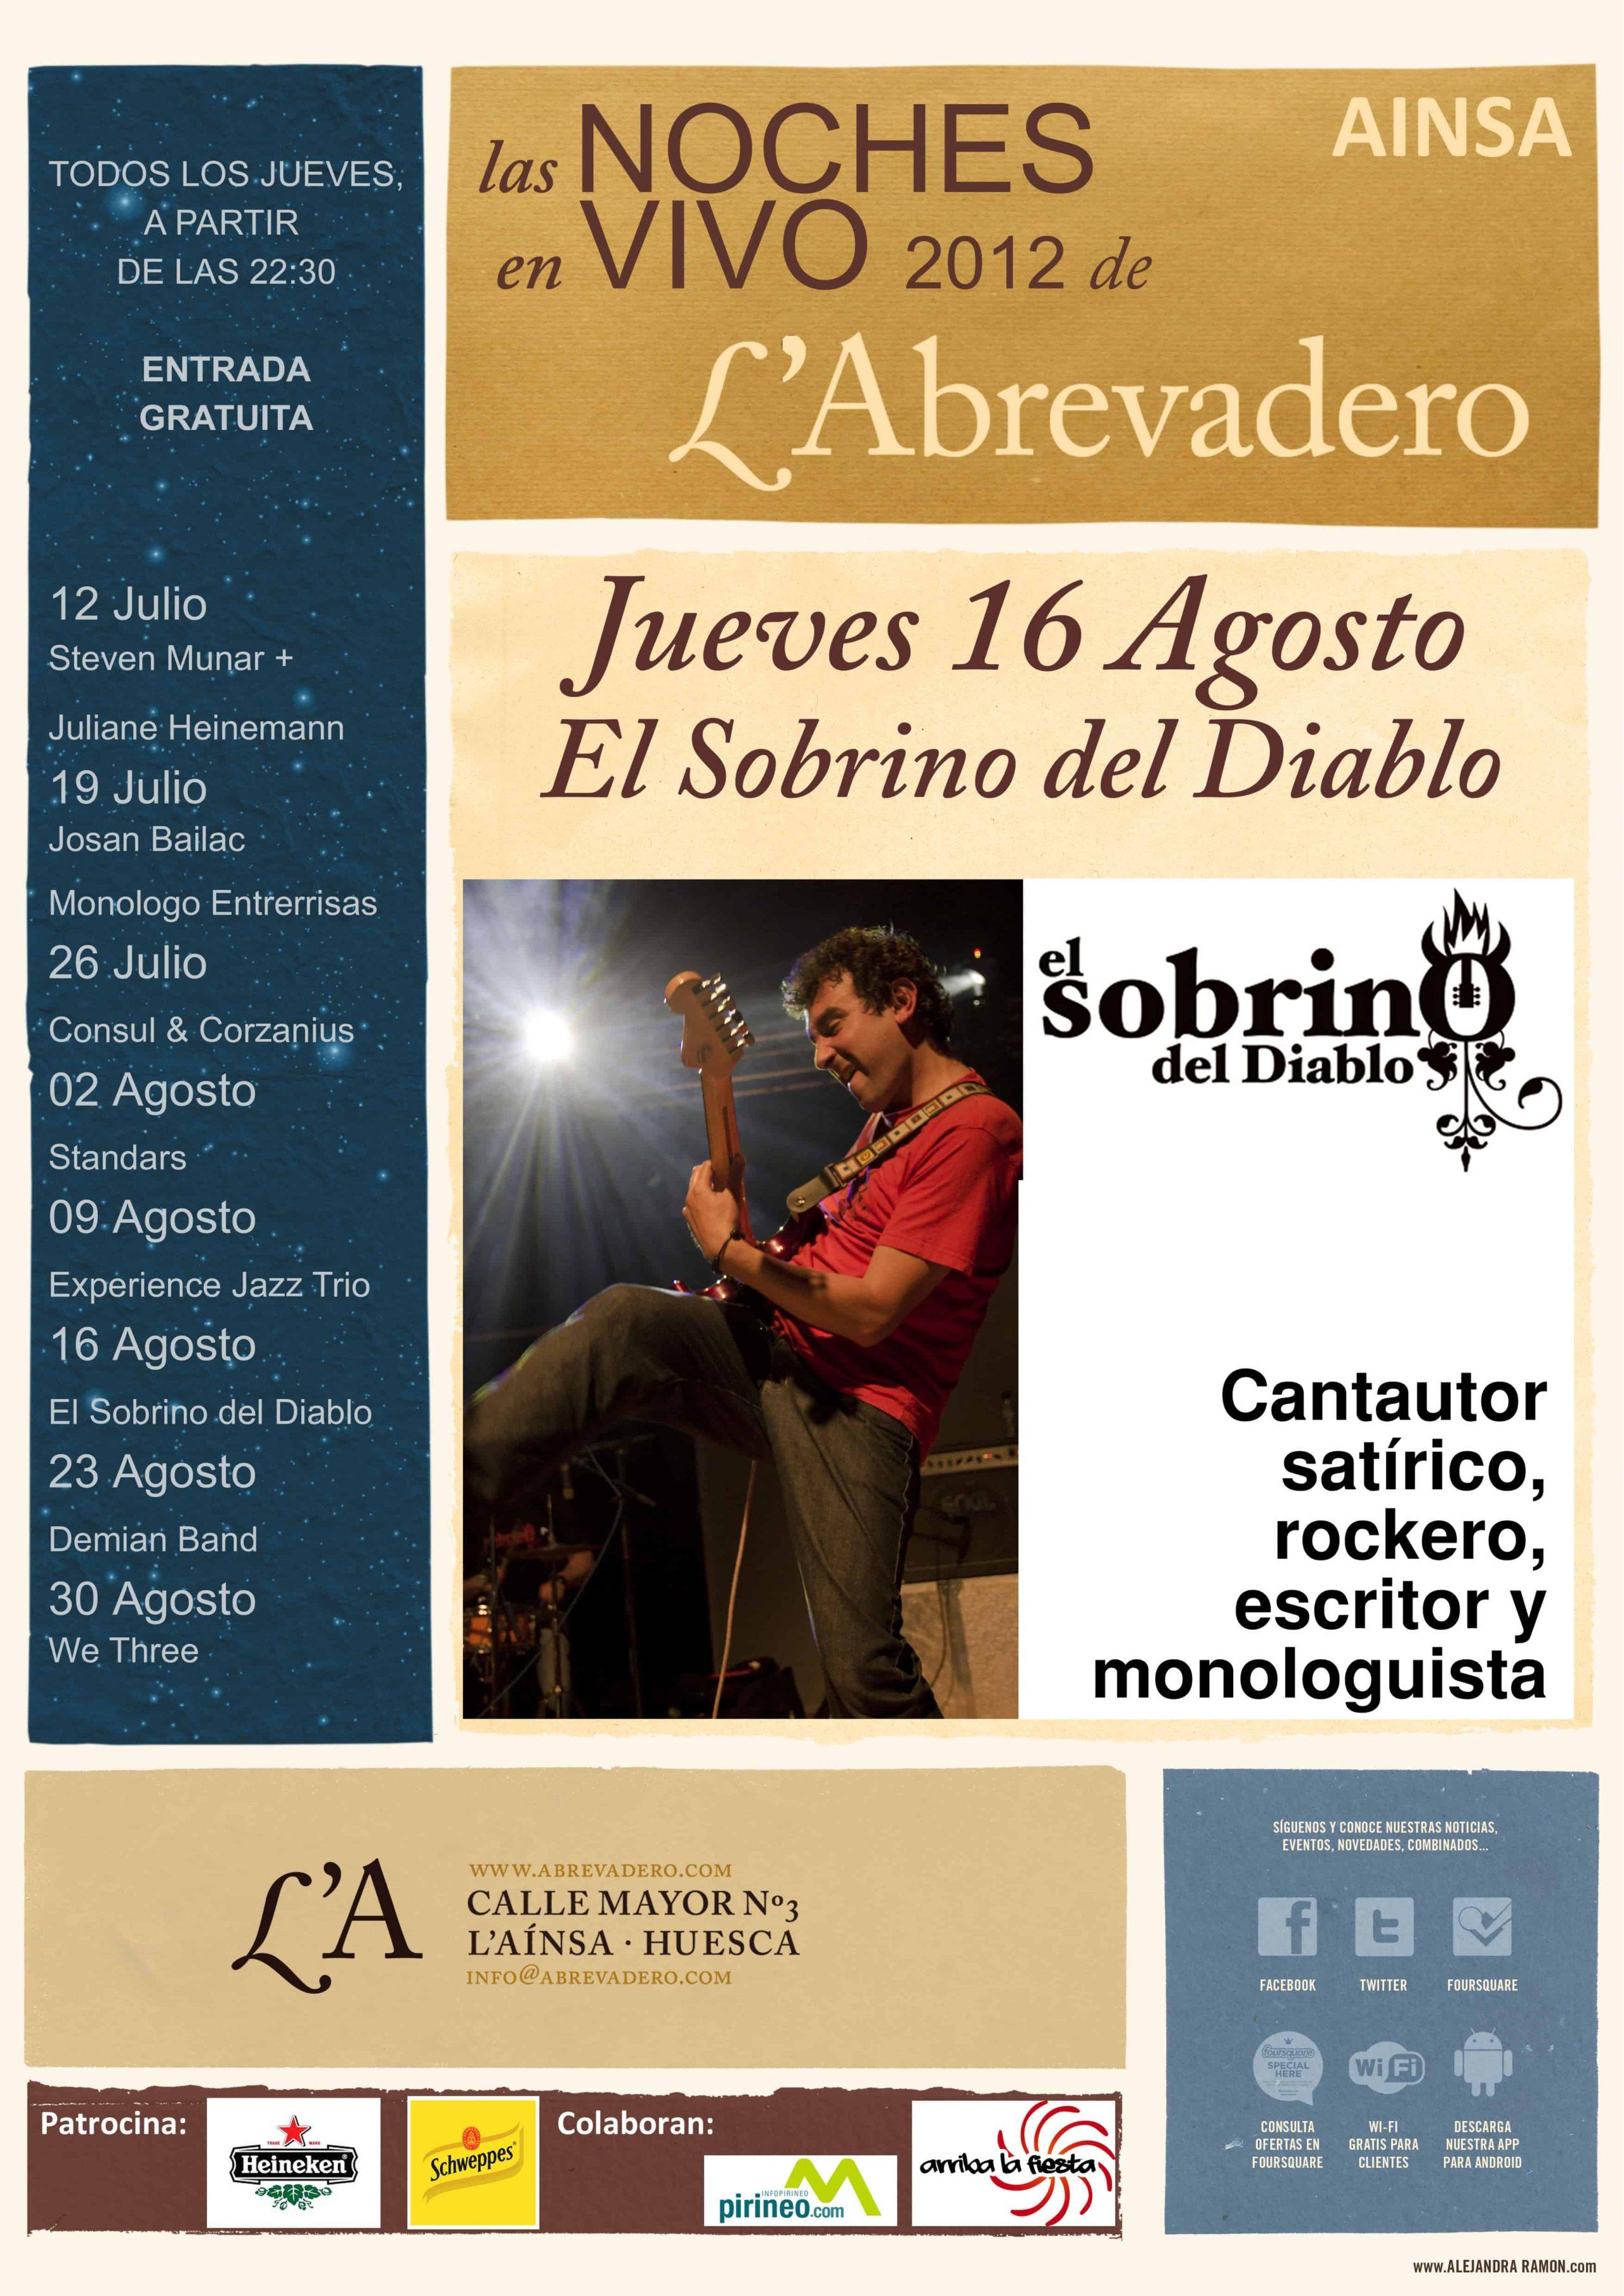 lasnochesenvivolabrevadero2012-elsobrinodeldiablo.jpg